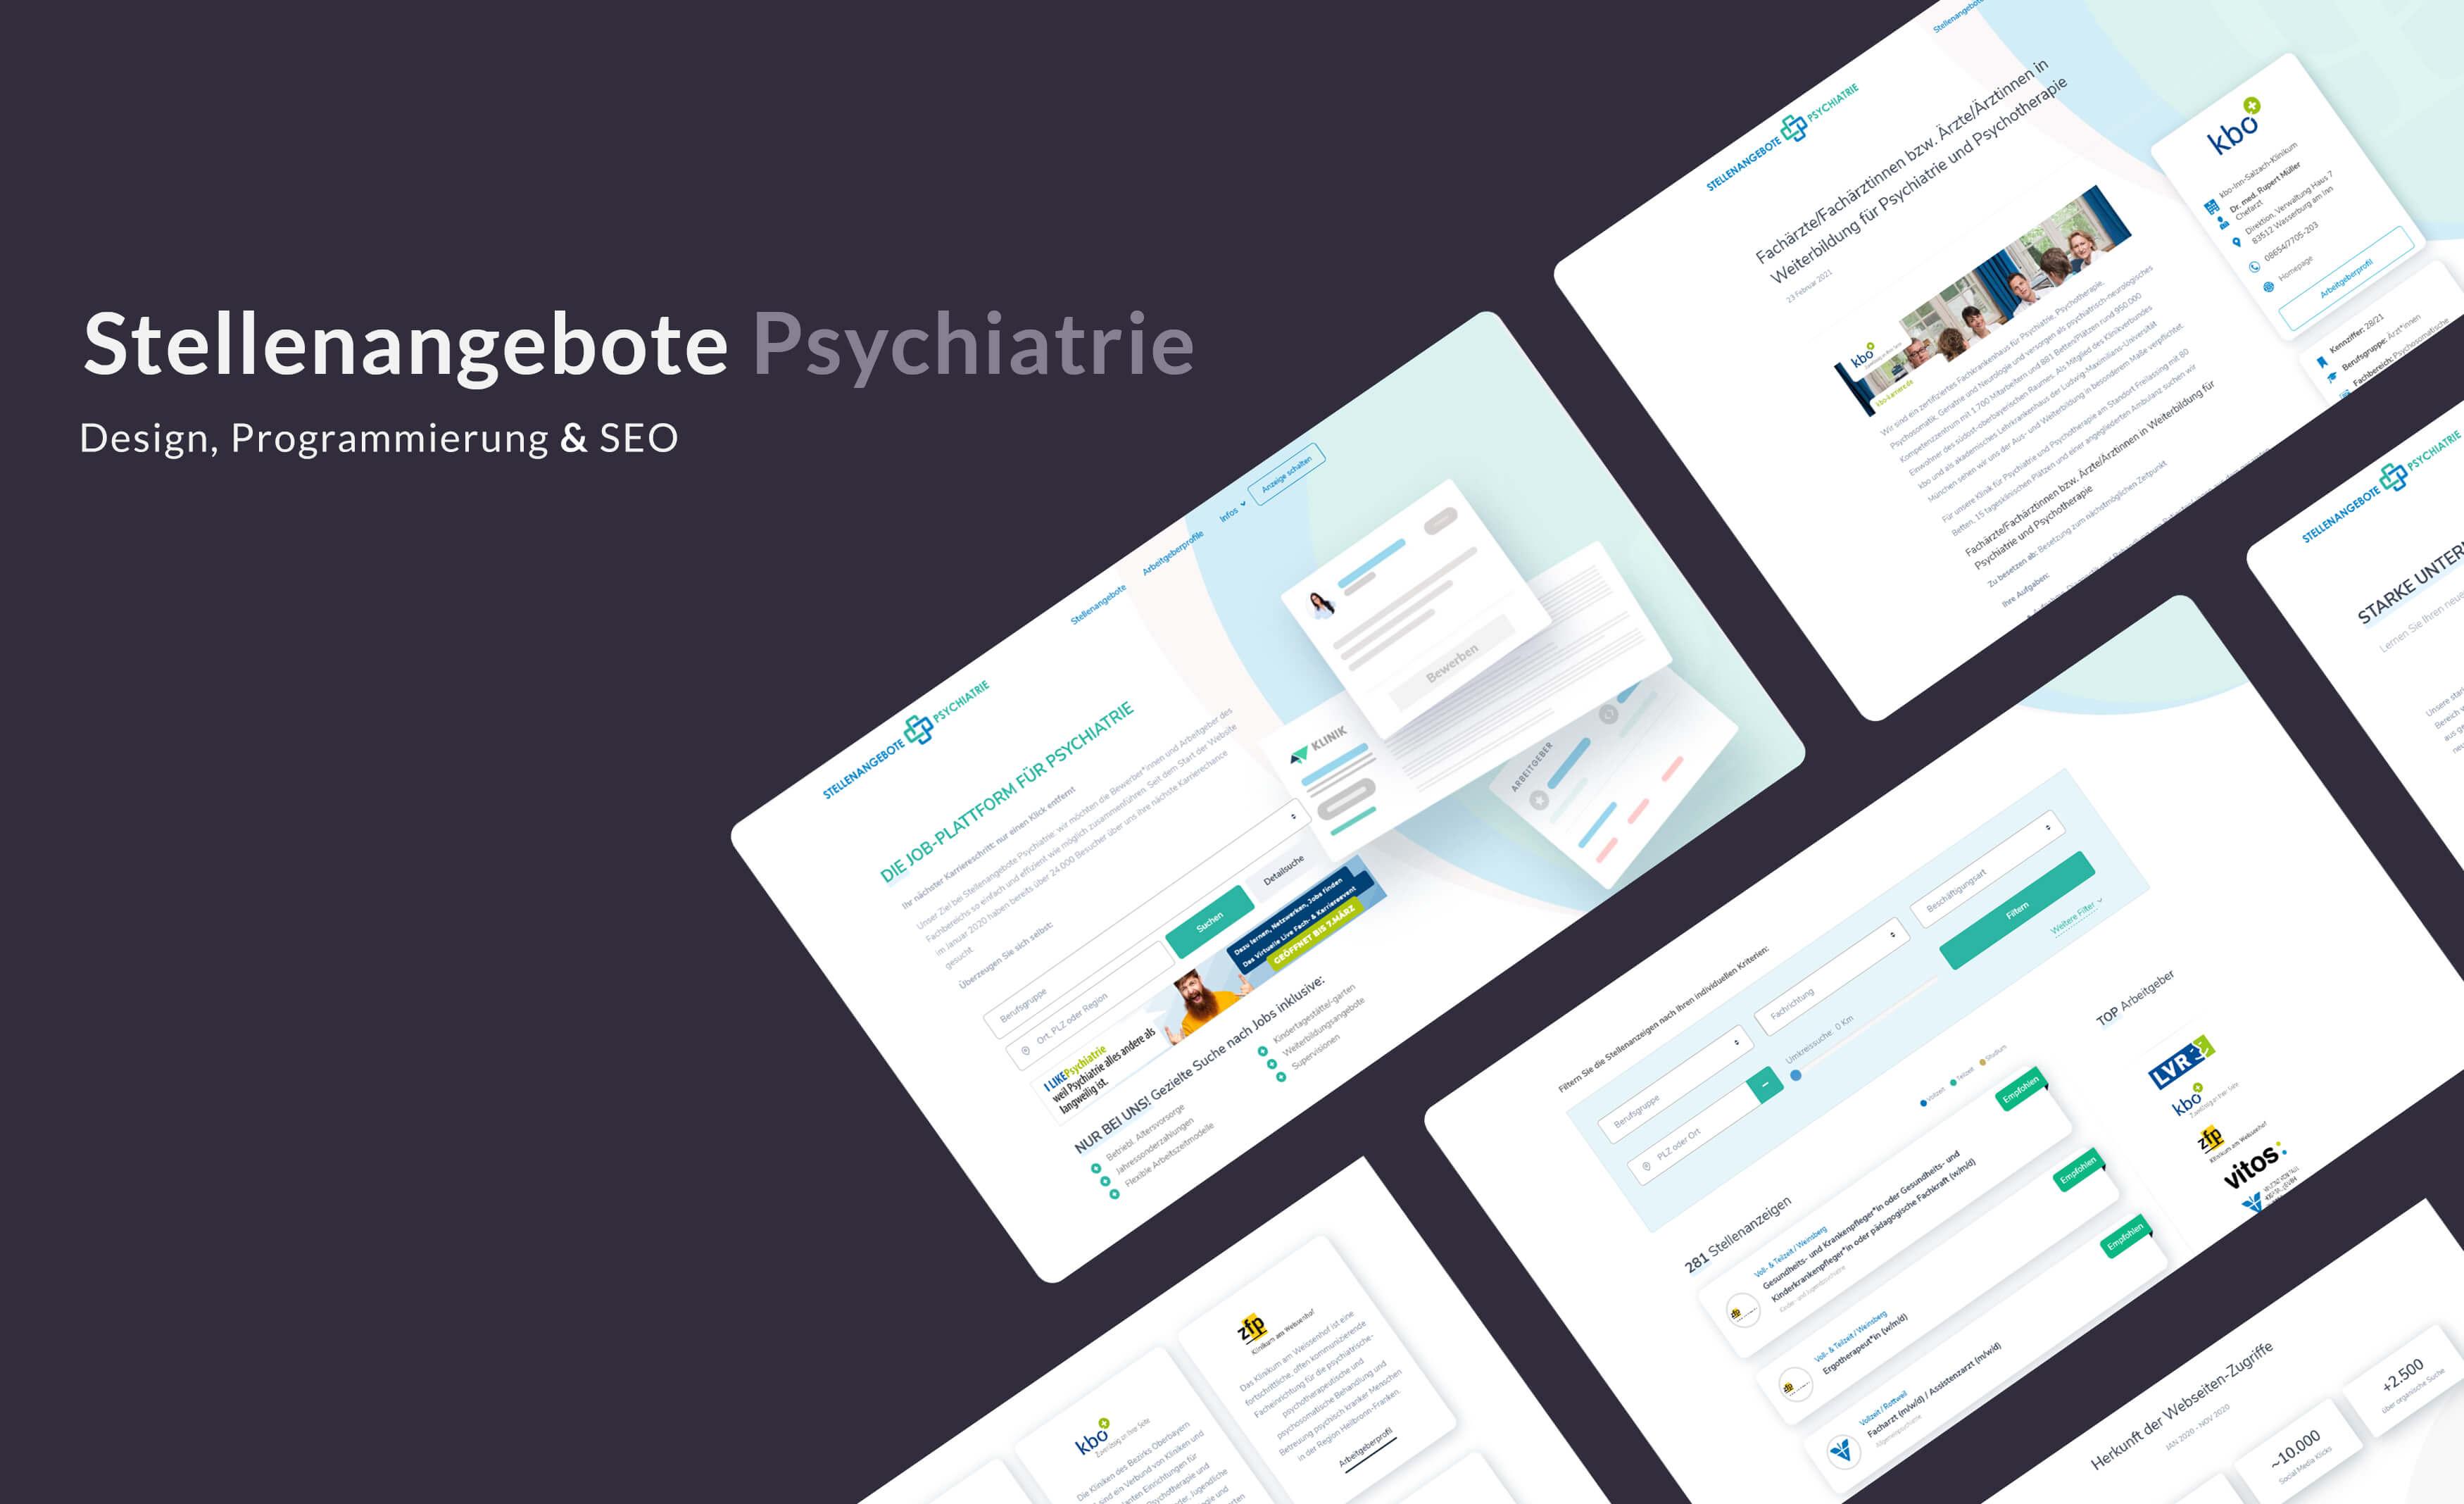 Stellenangebote Psychiatrie